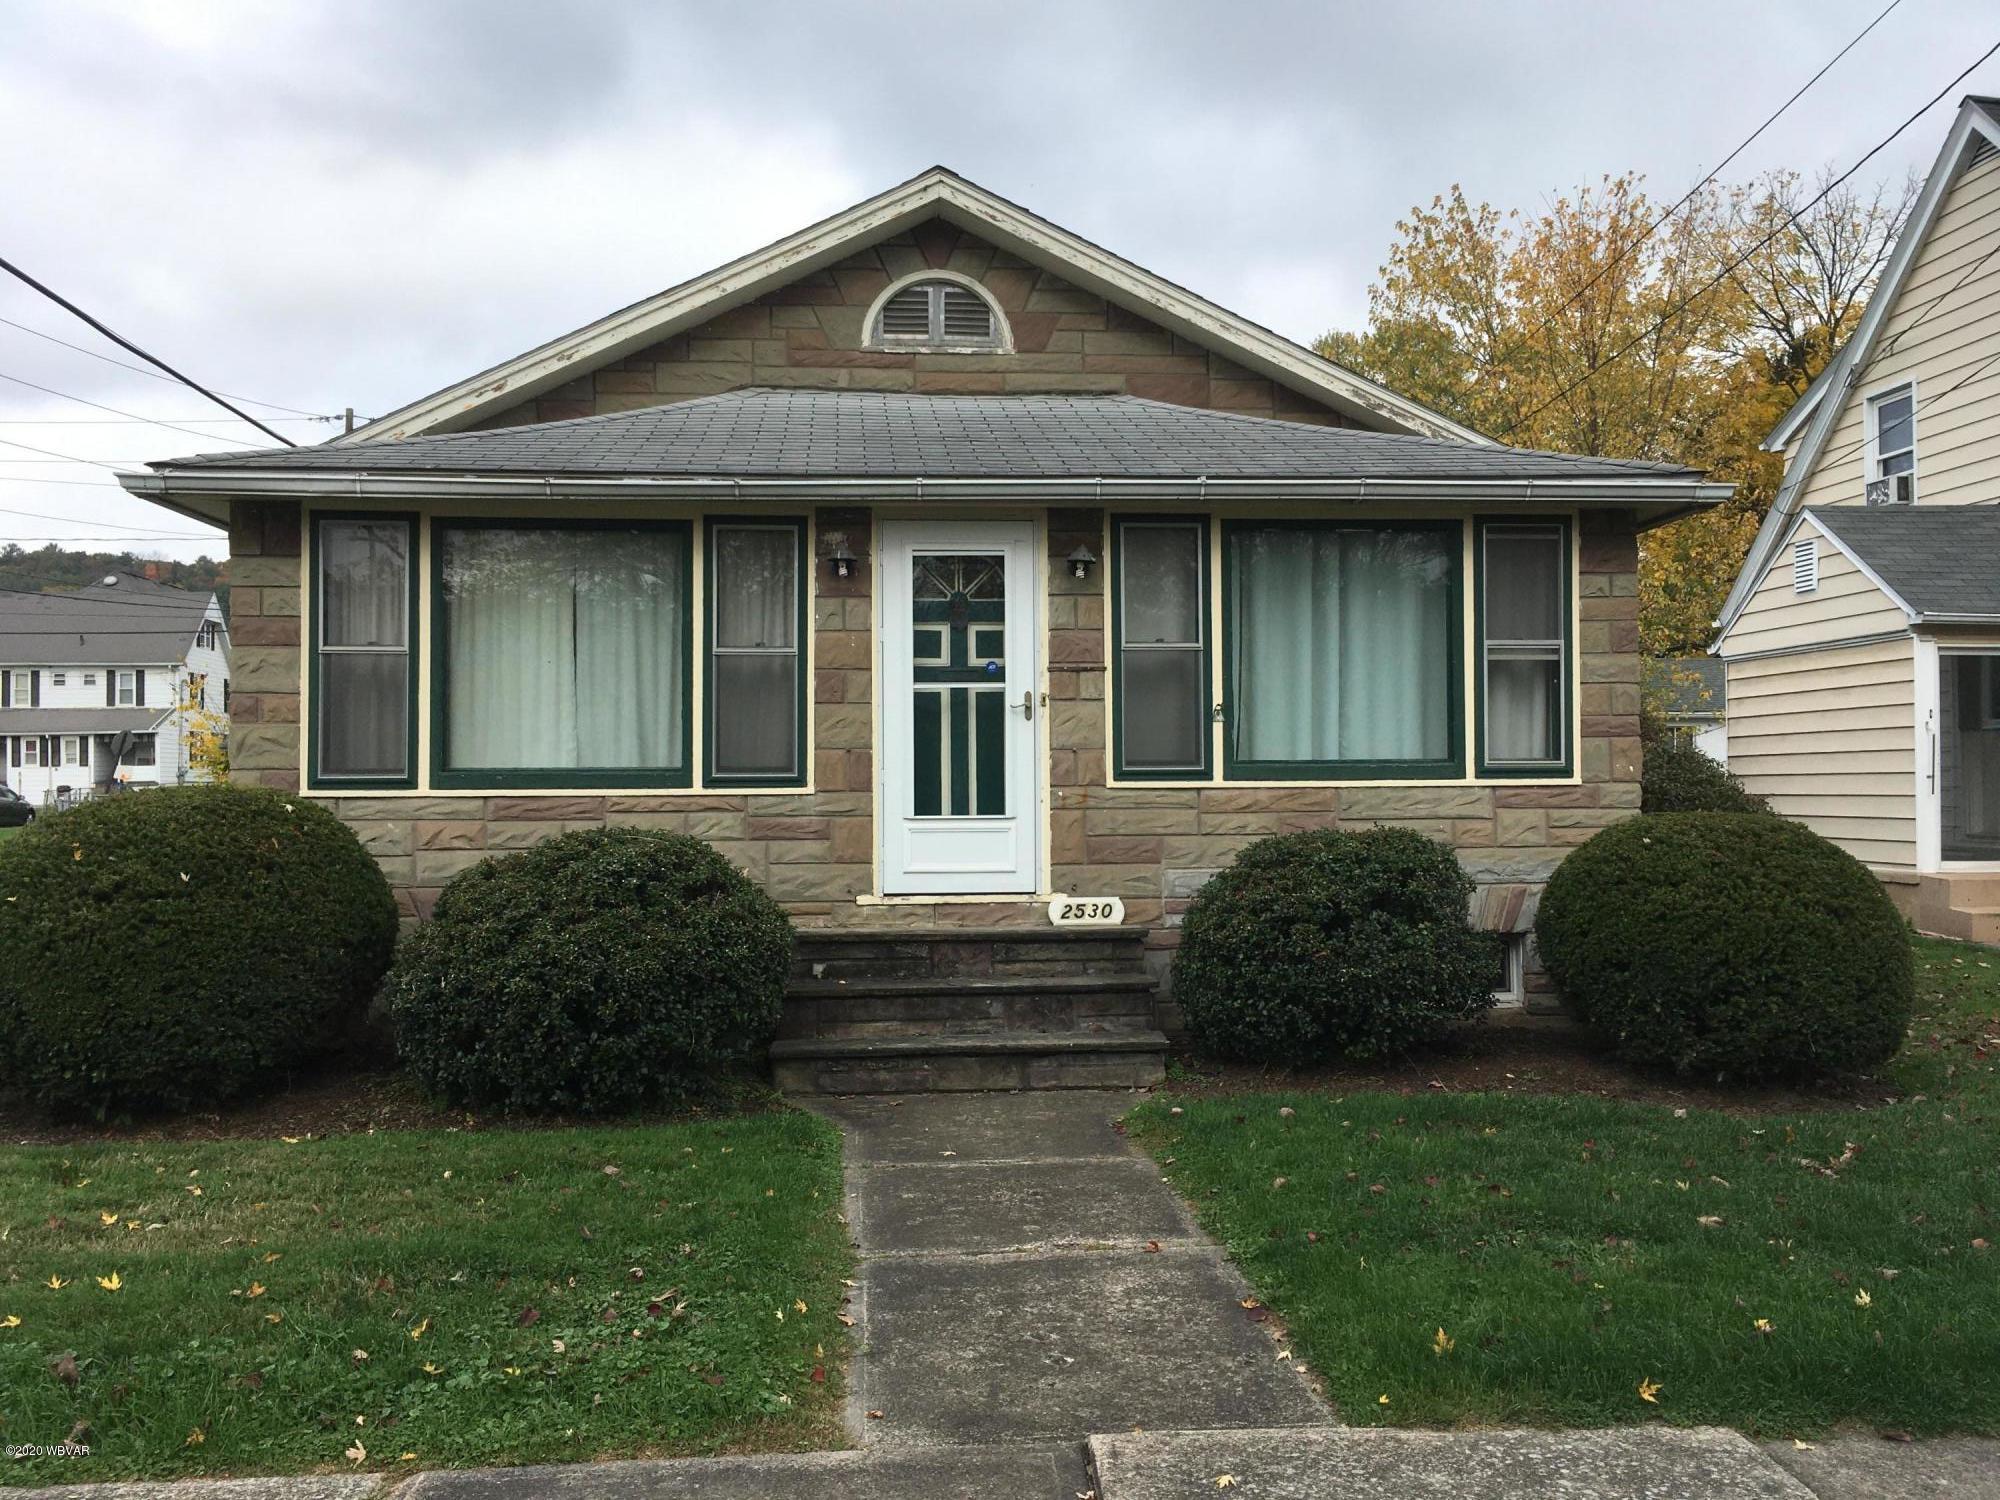 2530 LINN STREET, Williamsport, PA 17701, 3 Bedrooms Bedrooms, ,1 BathroomBathrooms,Residential,For sale,LINN,WB-91427